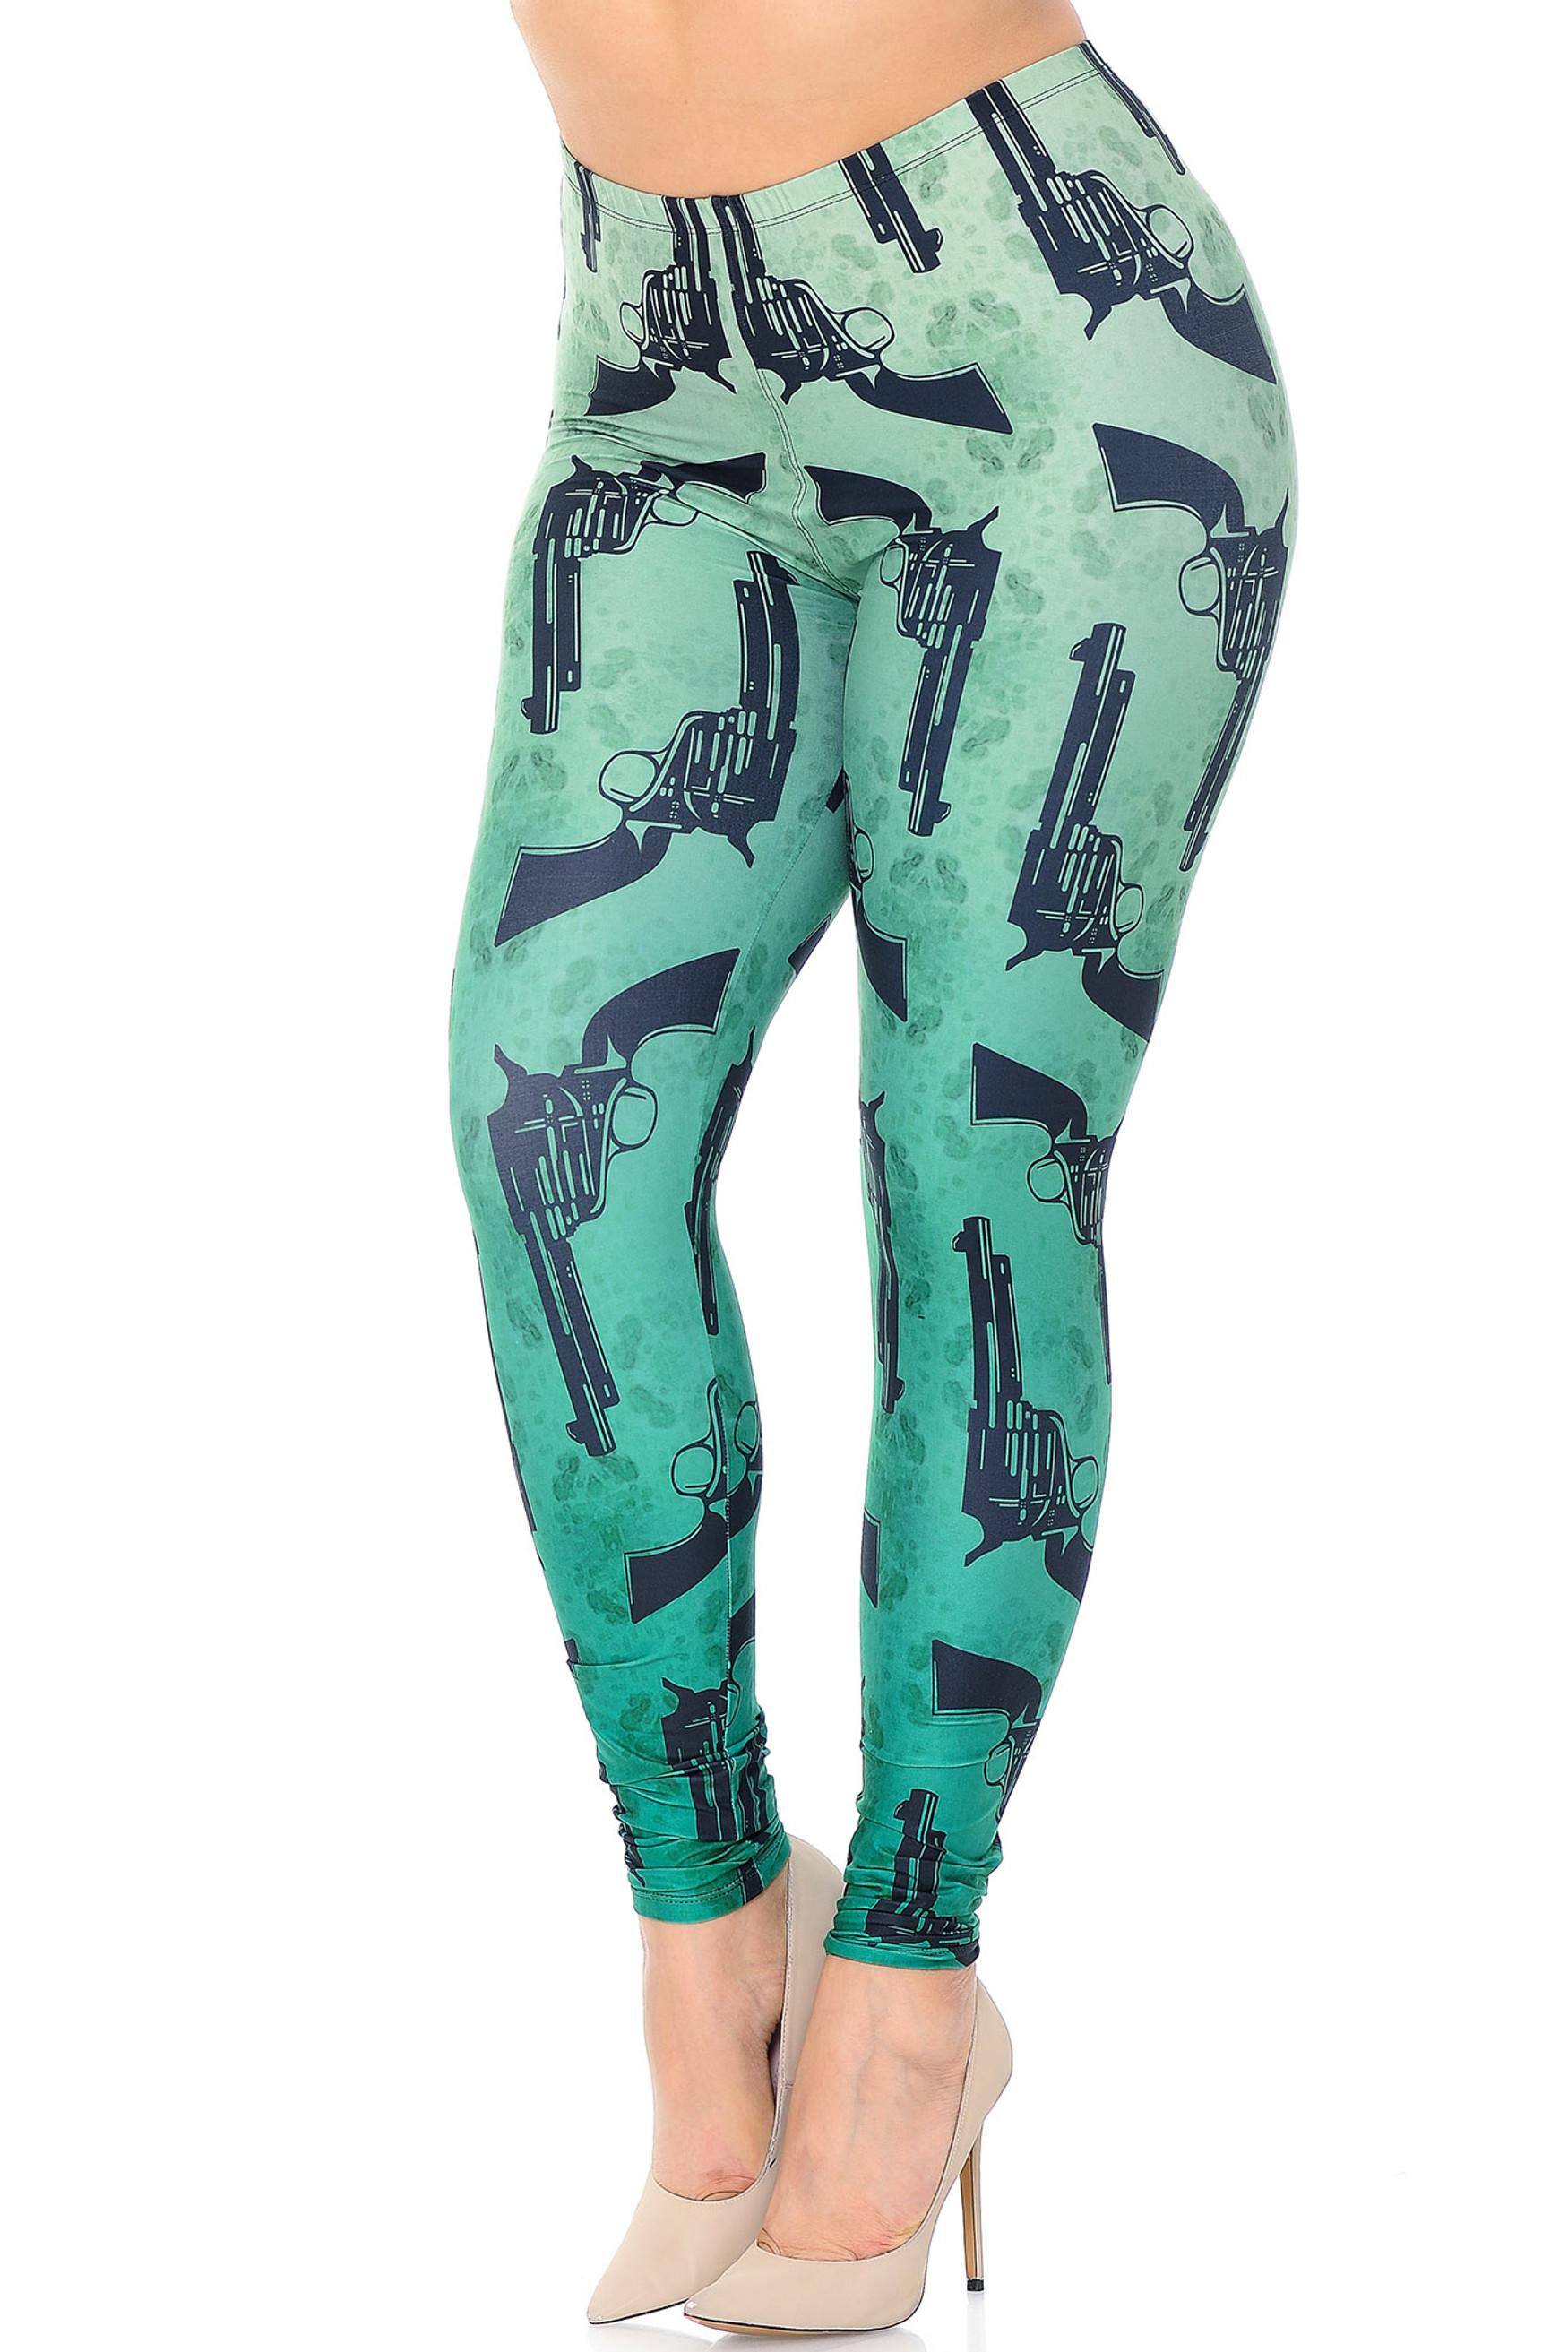 Creamy Soft Ombre Green Guns Plus Size Leggings